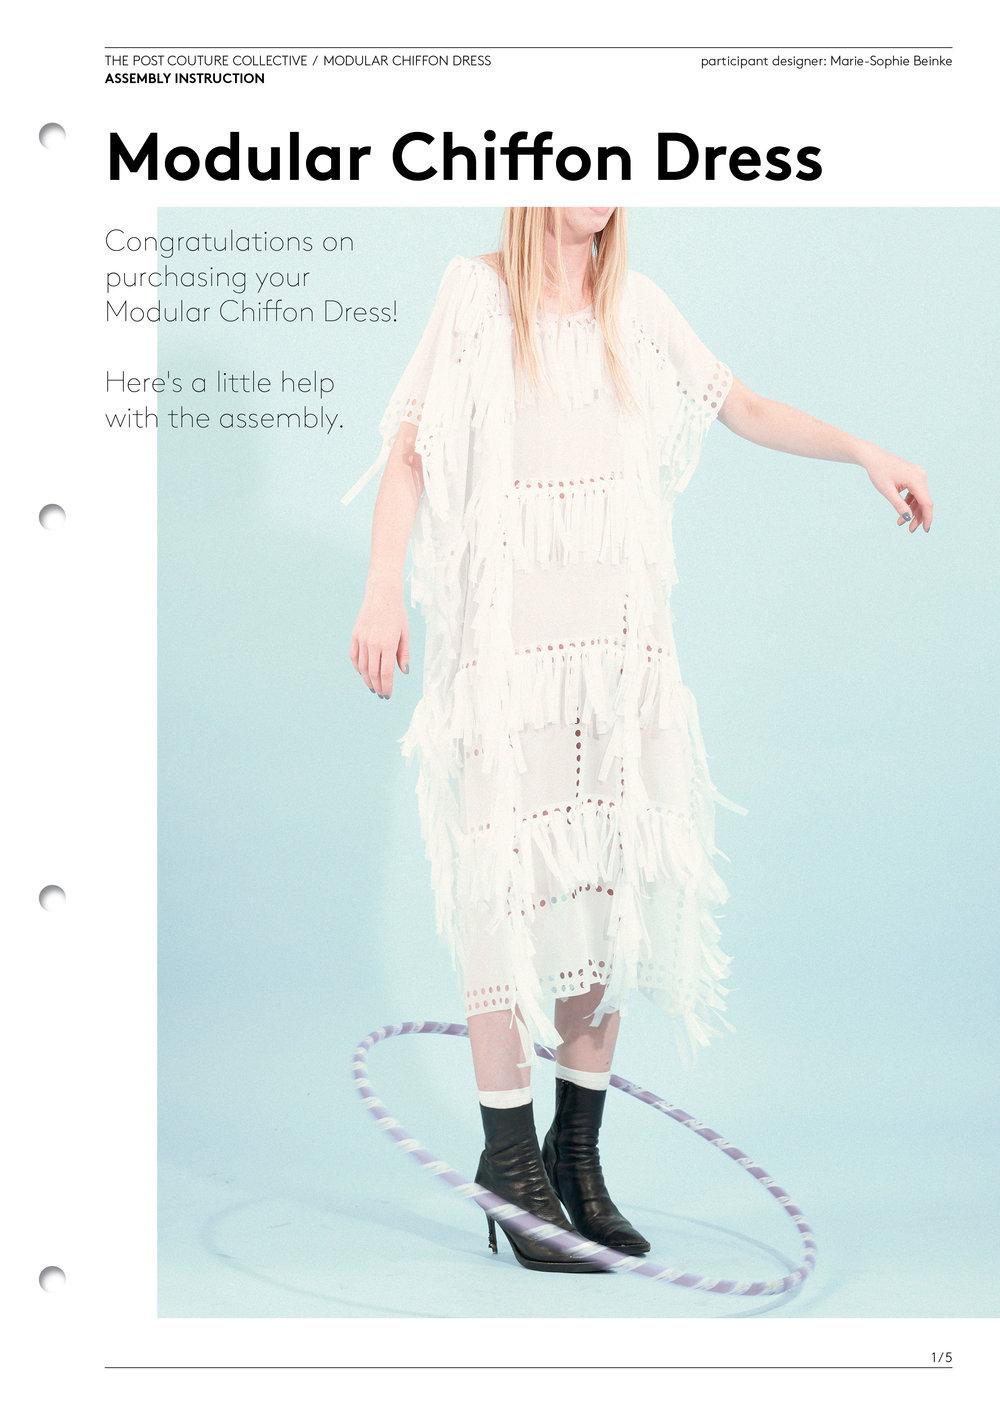 PCC_AI_Modular_Chiffon_Dress_mvs.jpg